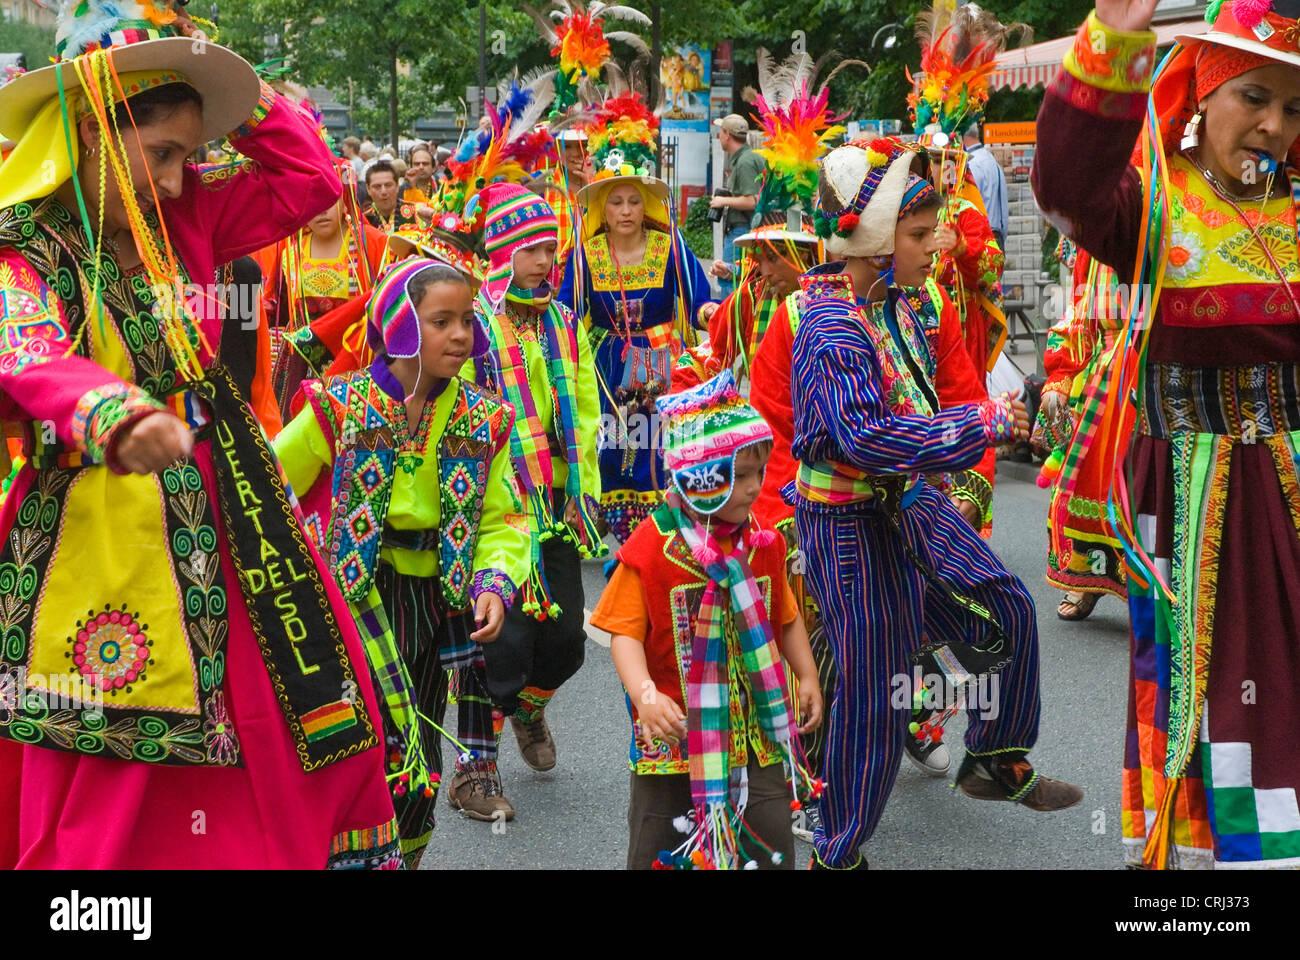 Parade der Kulturen, Frankfurt Am Main, Hessen, Deutschland Stockbild